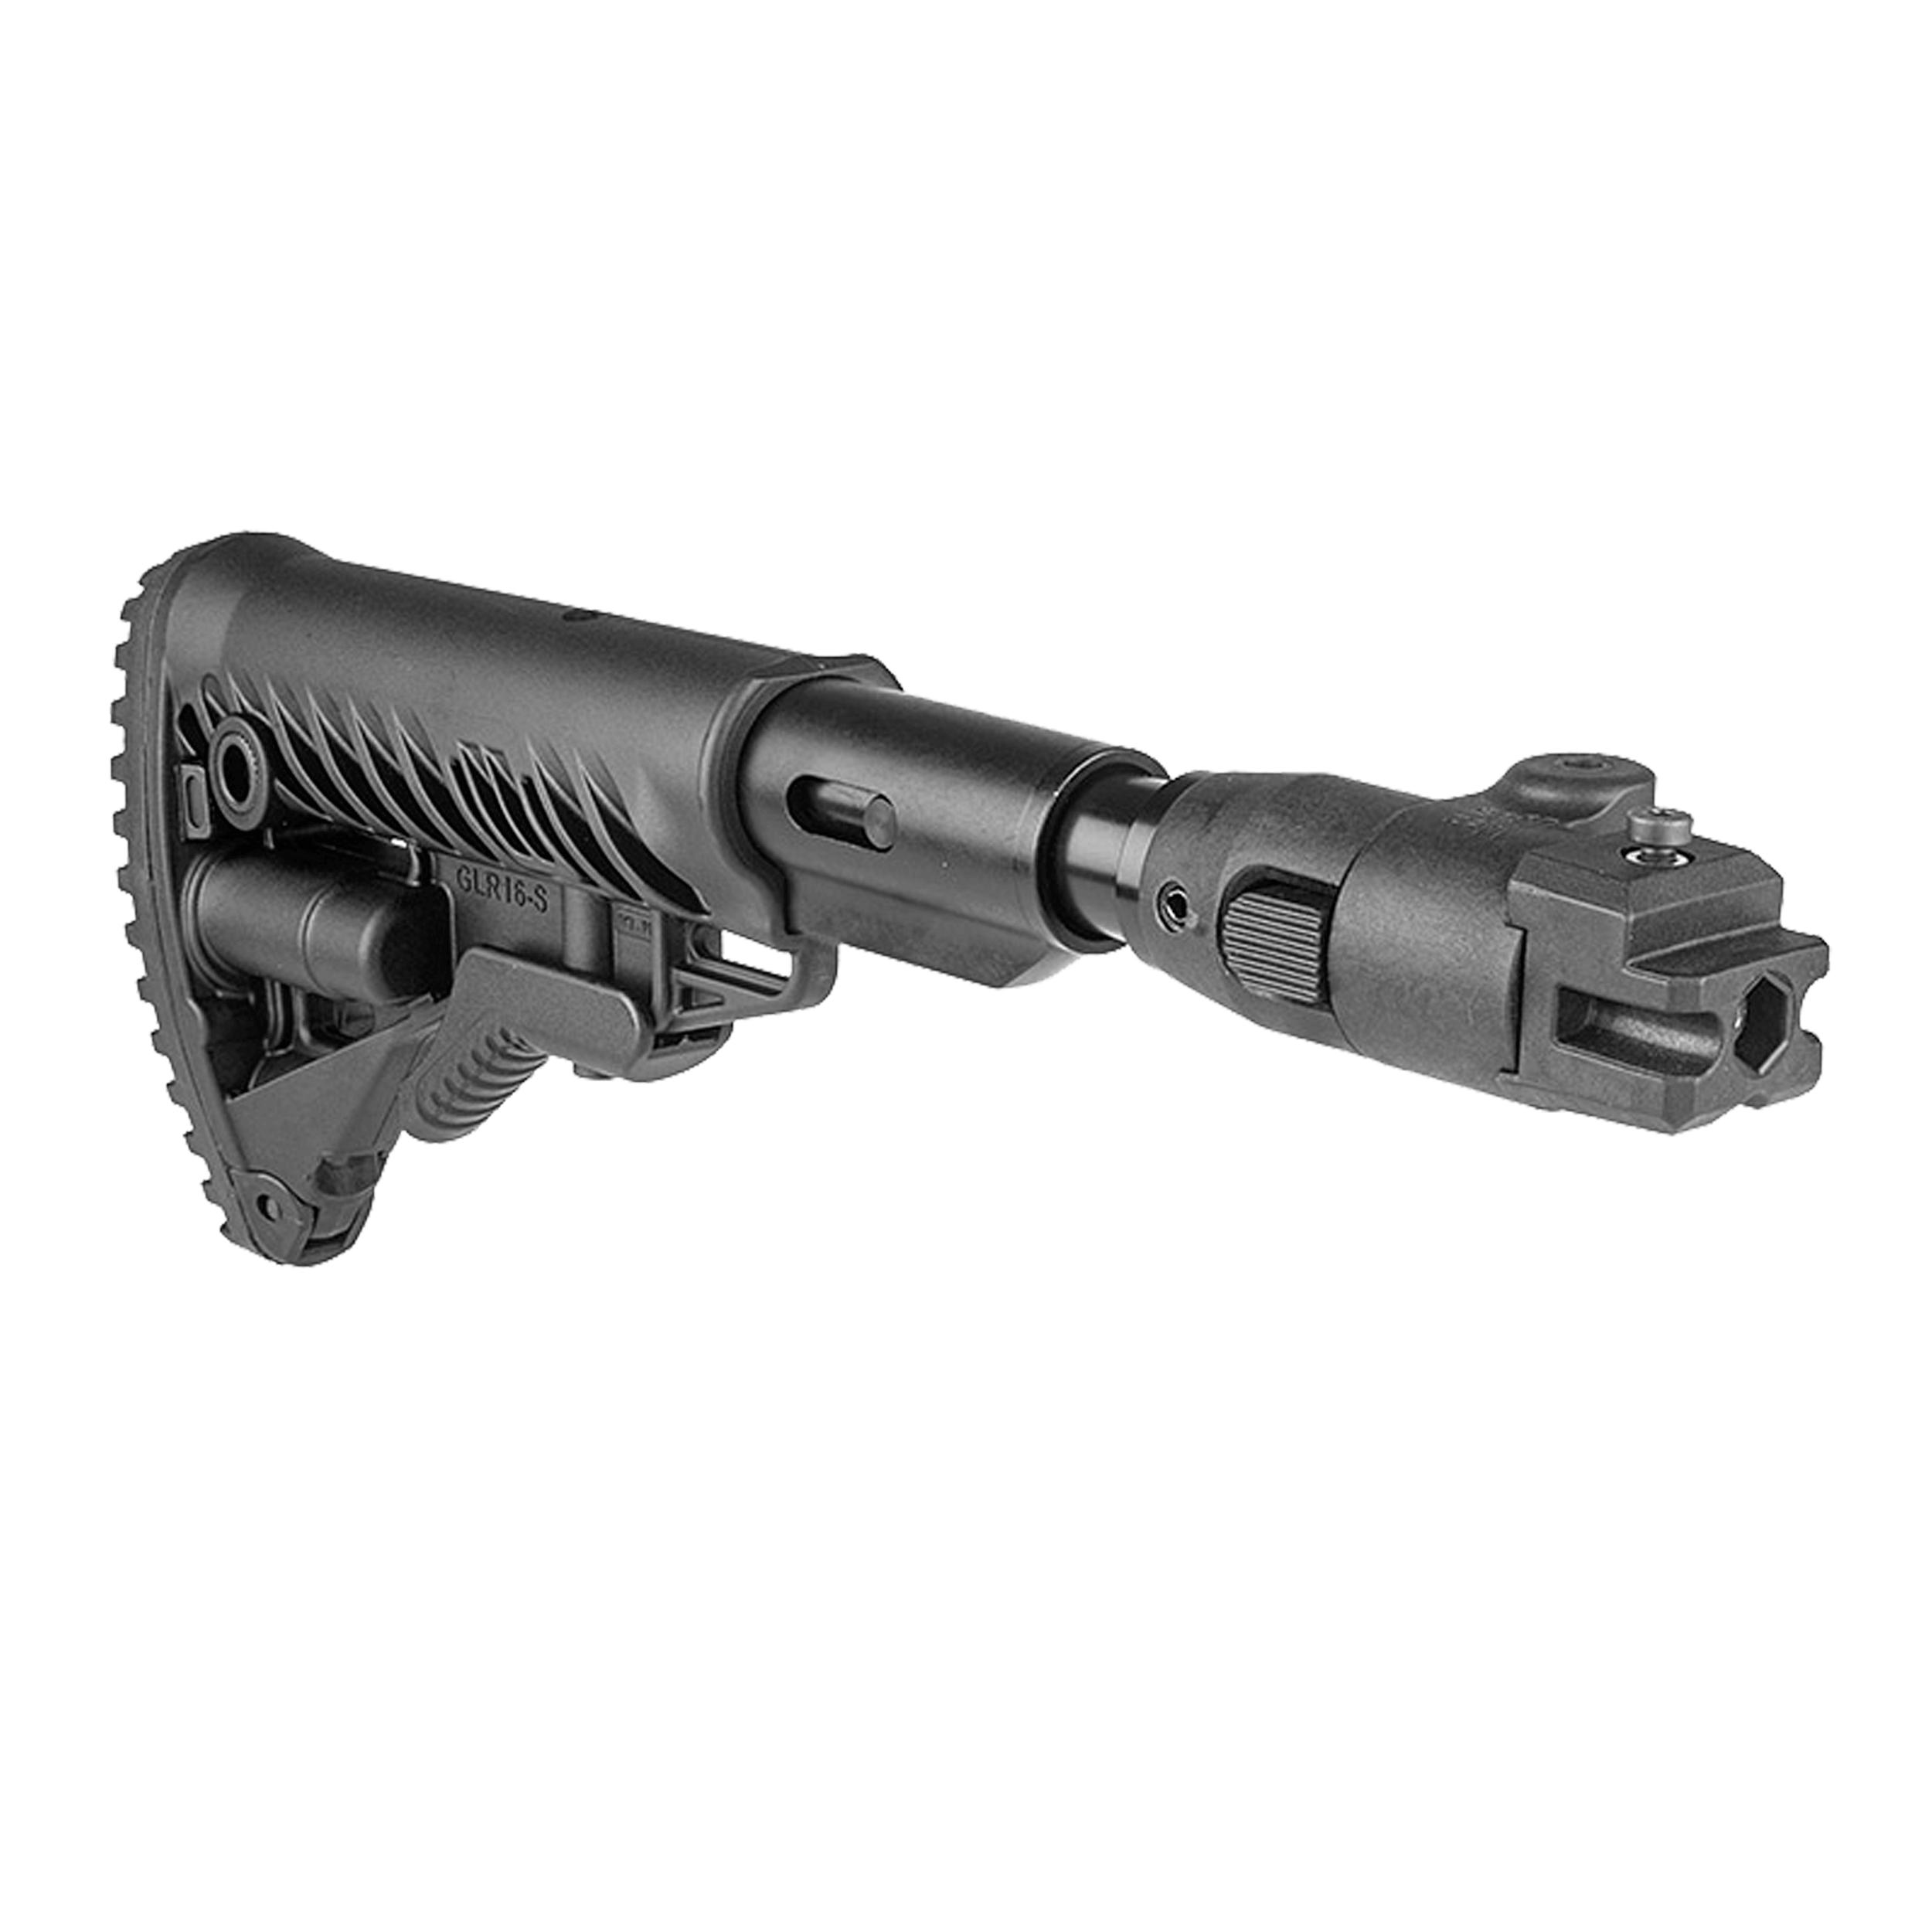 AK47 folding buttstock / shock absorbing (Polymer Joint)